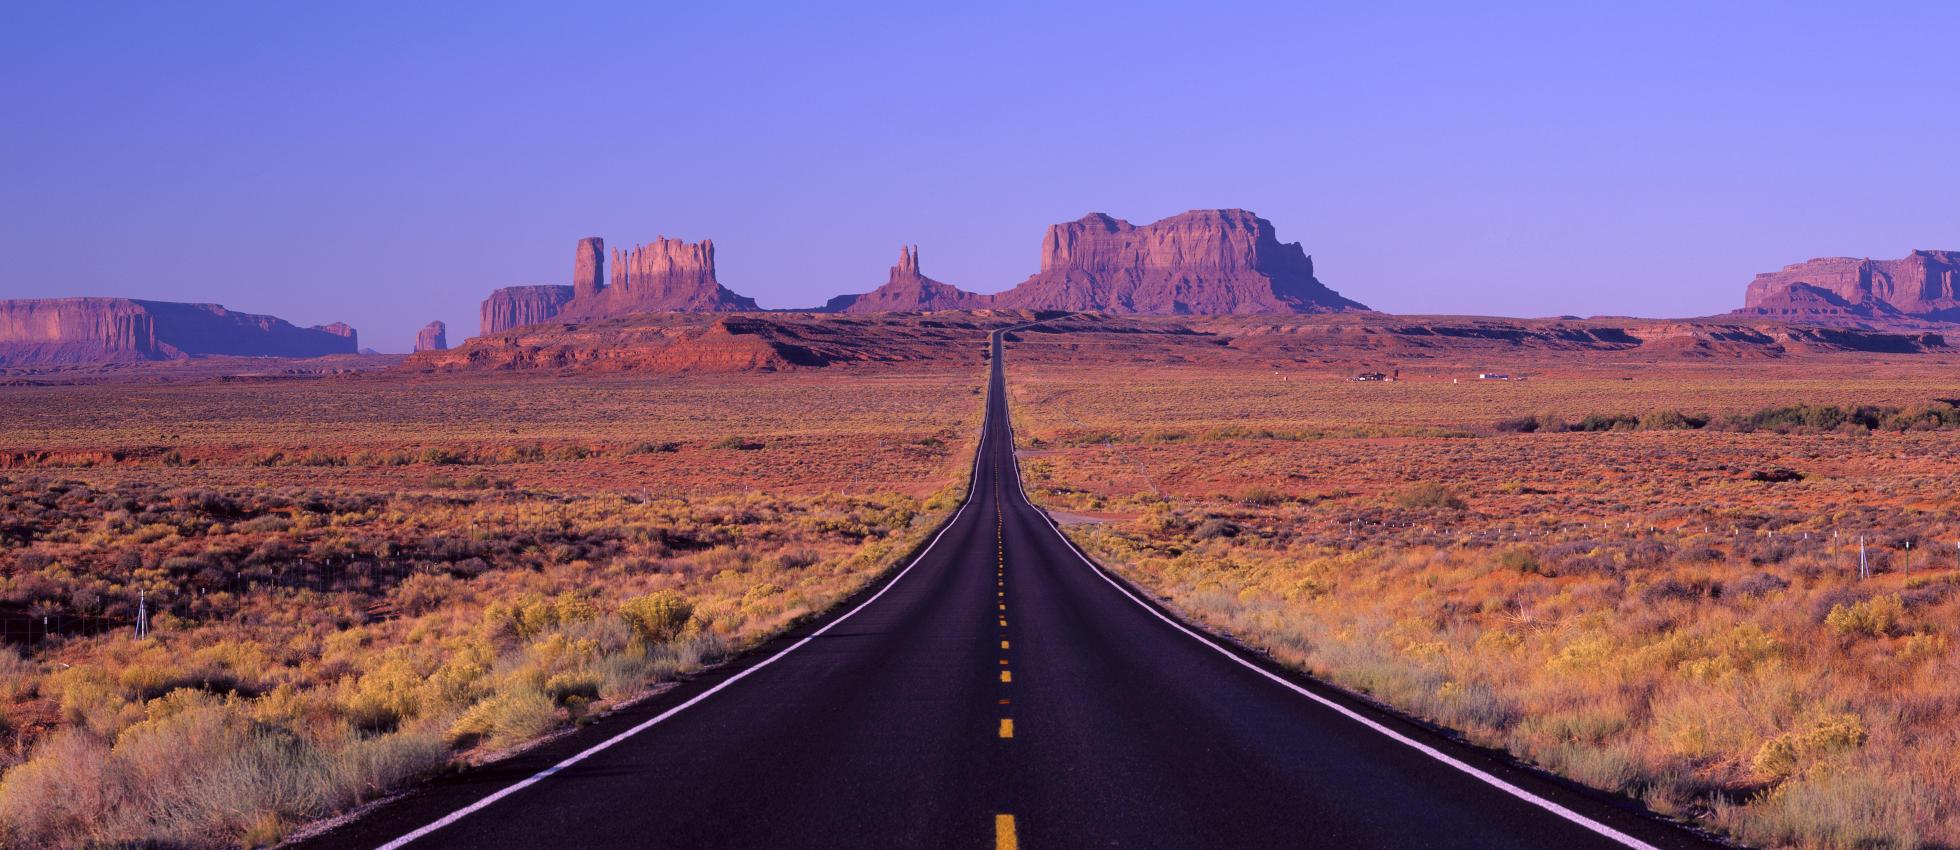 Gap Year Program - ARCC Gap | Southwest: Utah, Colorado, New Mexico, Arizona & California  3